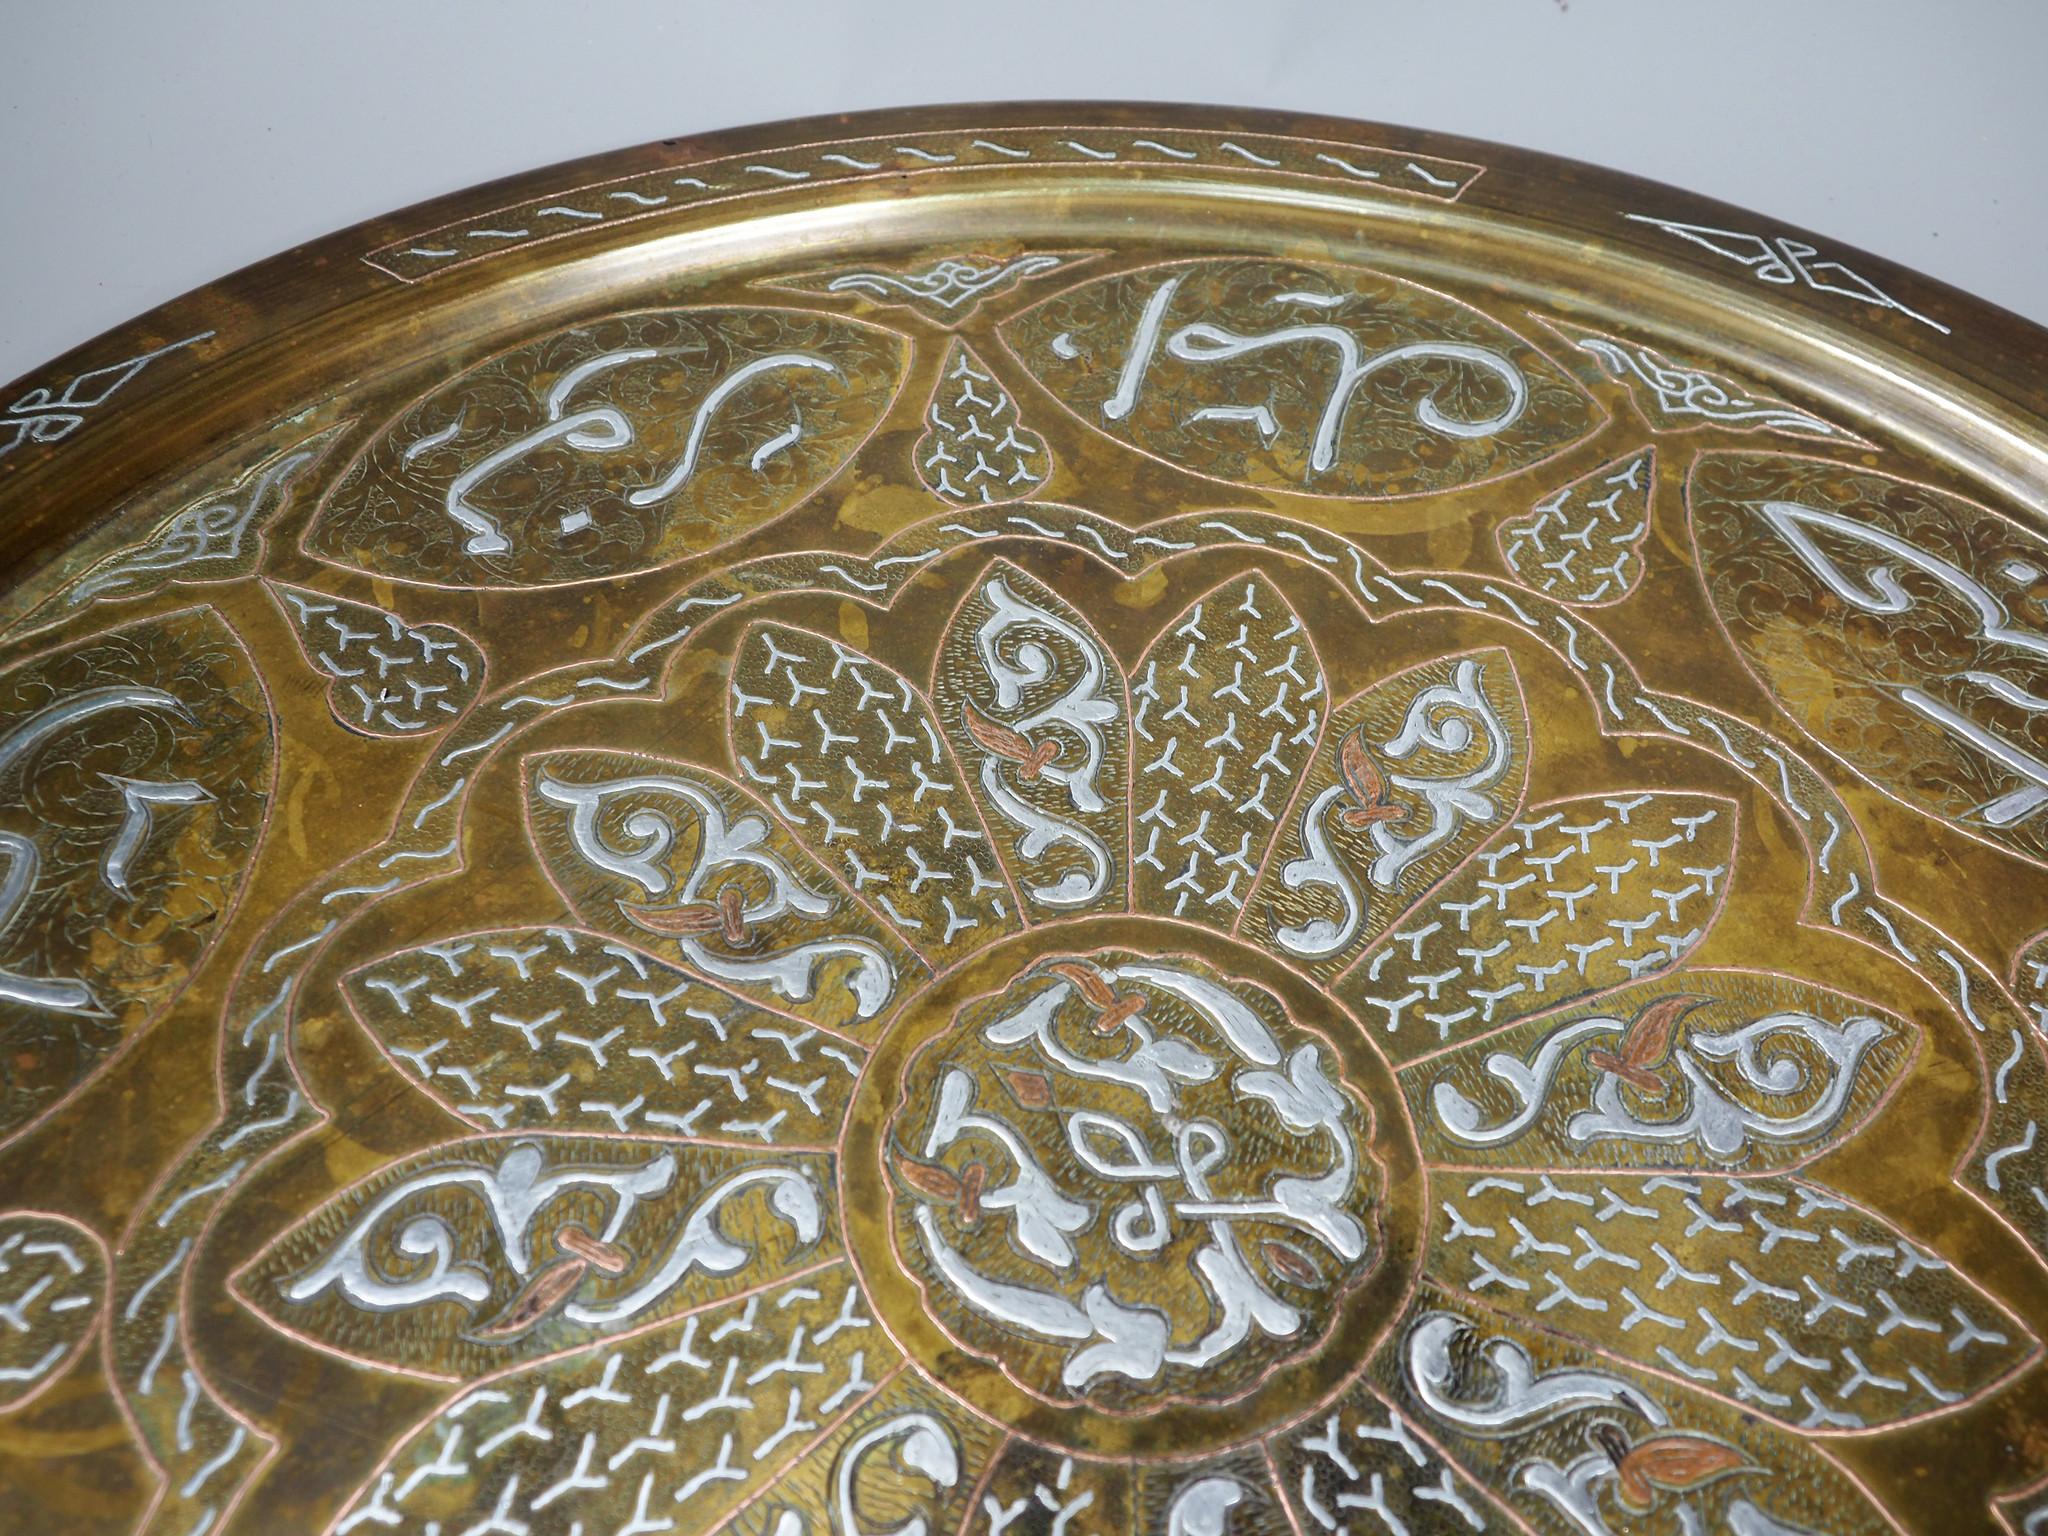 65 Ø antik osmanisch ägyptisch Mamluk Cairoware orient Messing tablett Teetisch beisteltisch Afghanistan syrien arabische kalligraphie 21/D